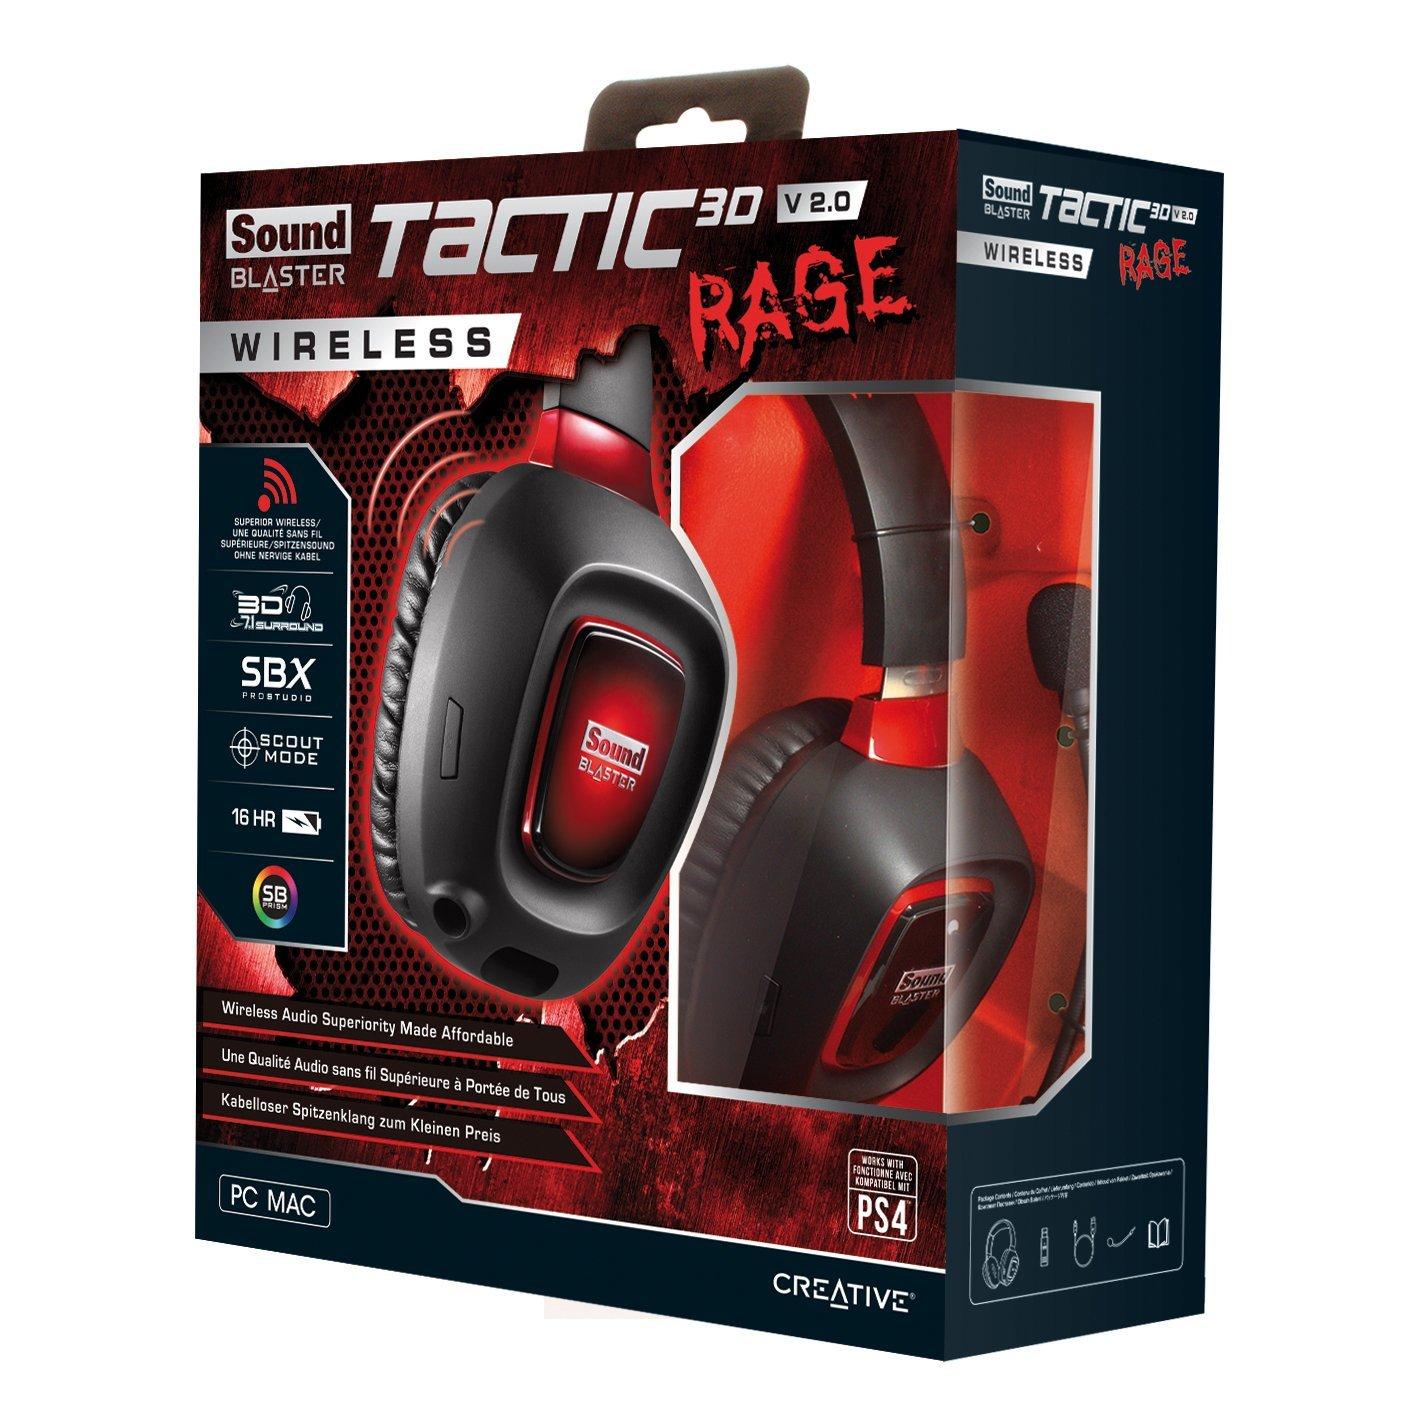 Creative Sound Blaster Tactic3d Rage Wireless v2.0, autonomía